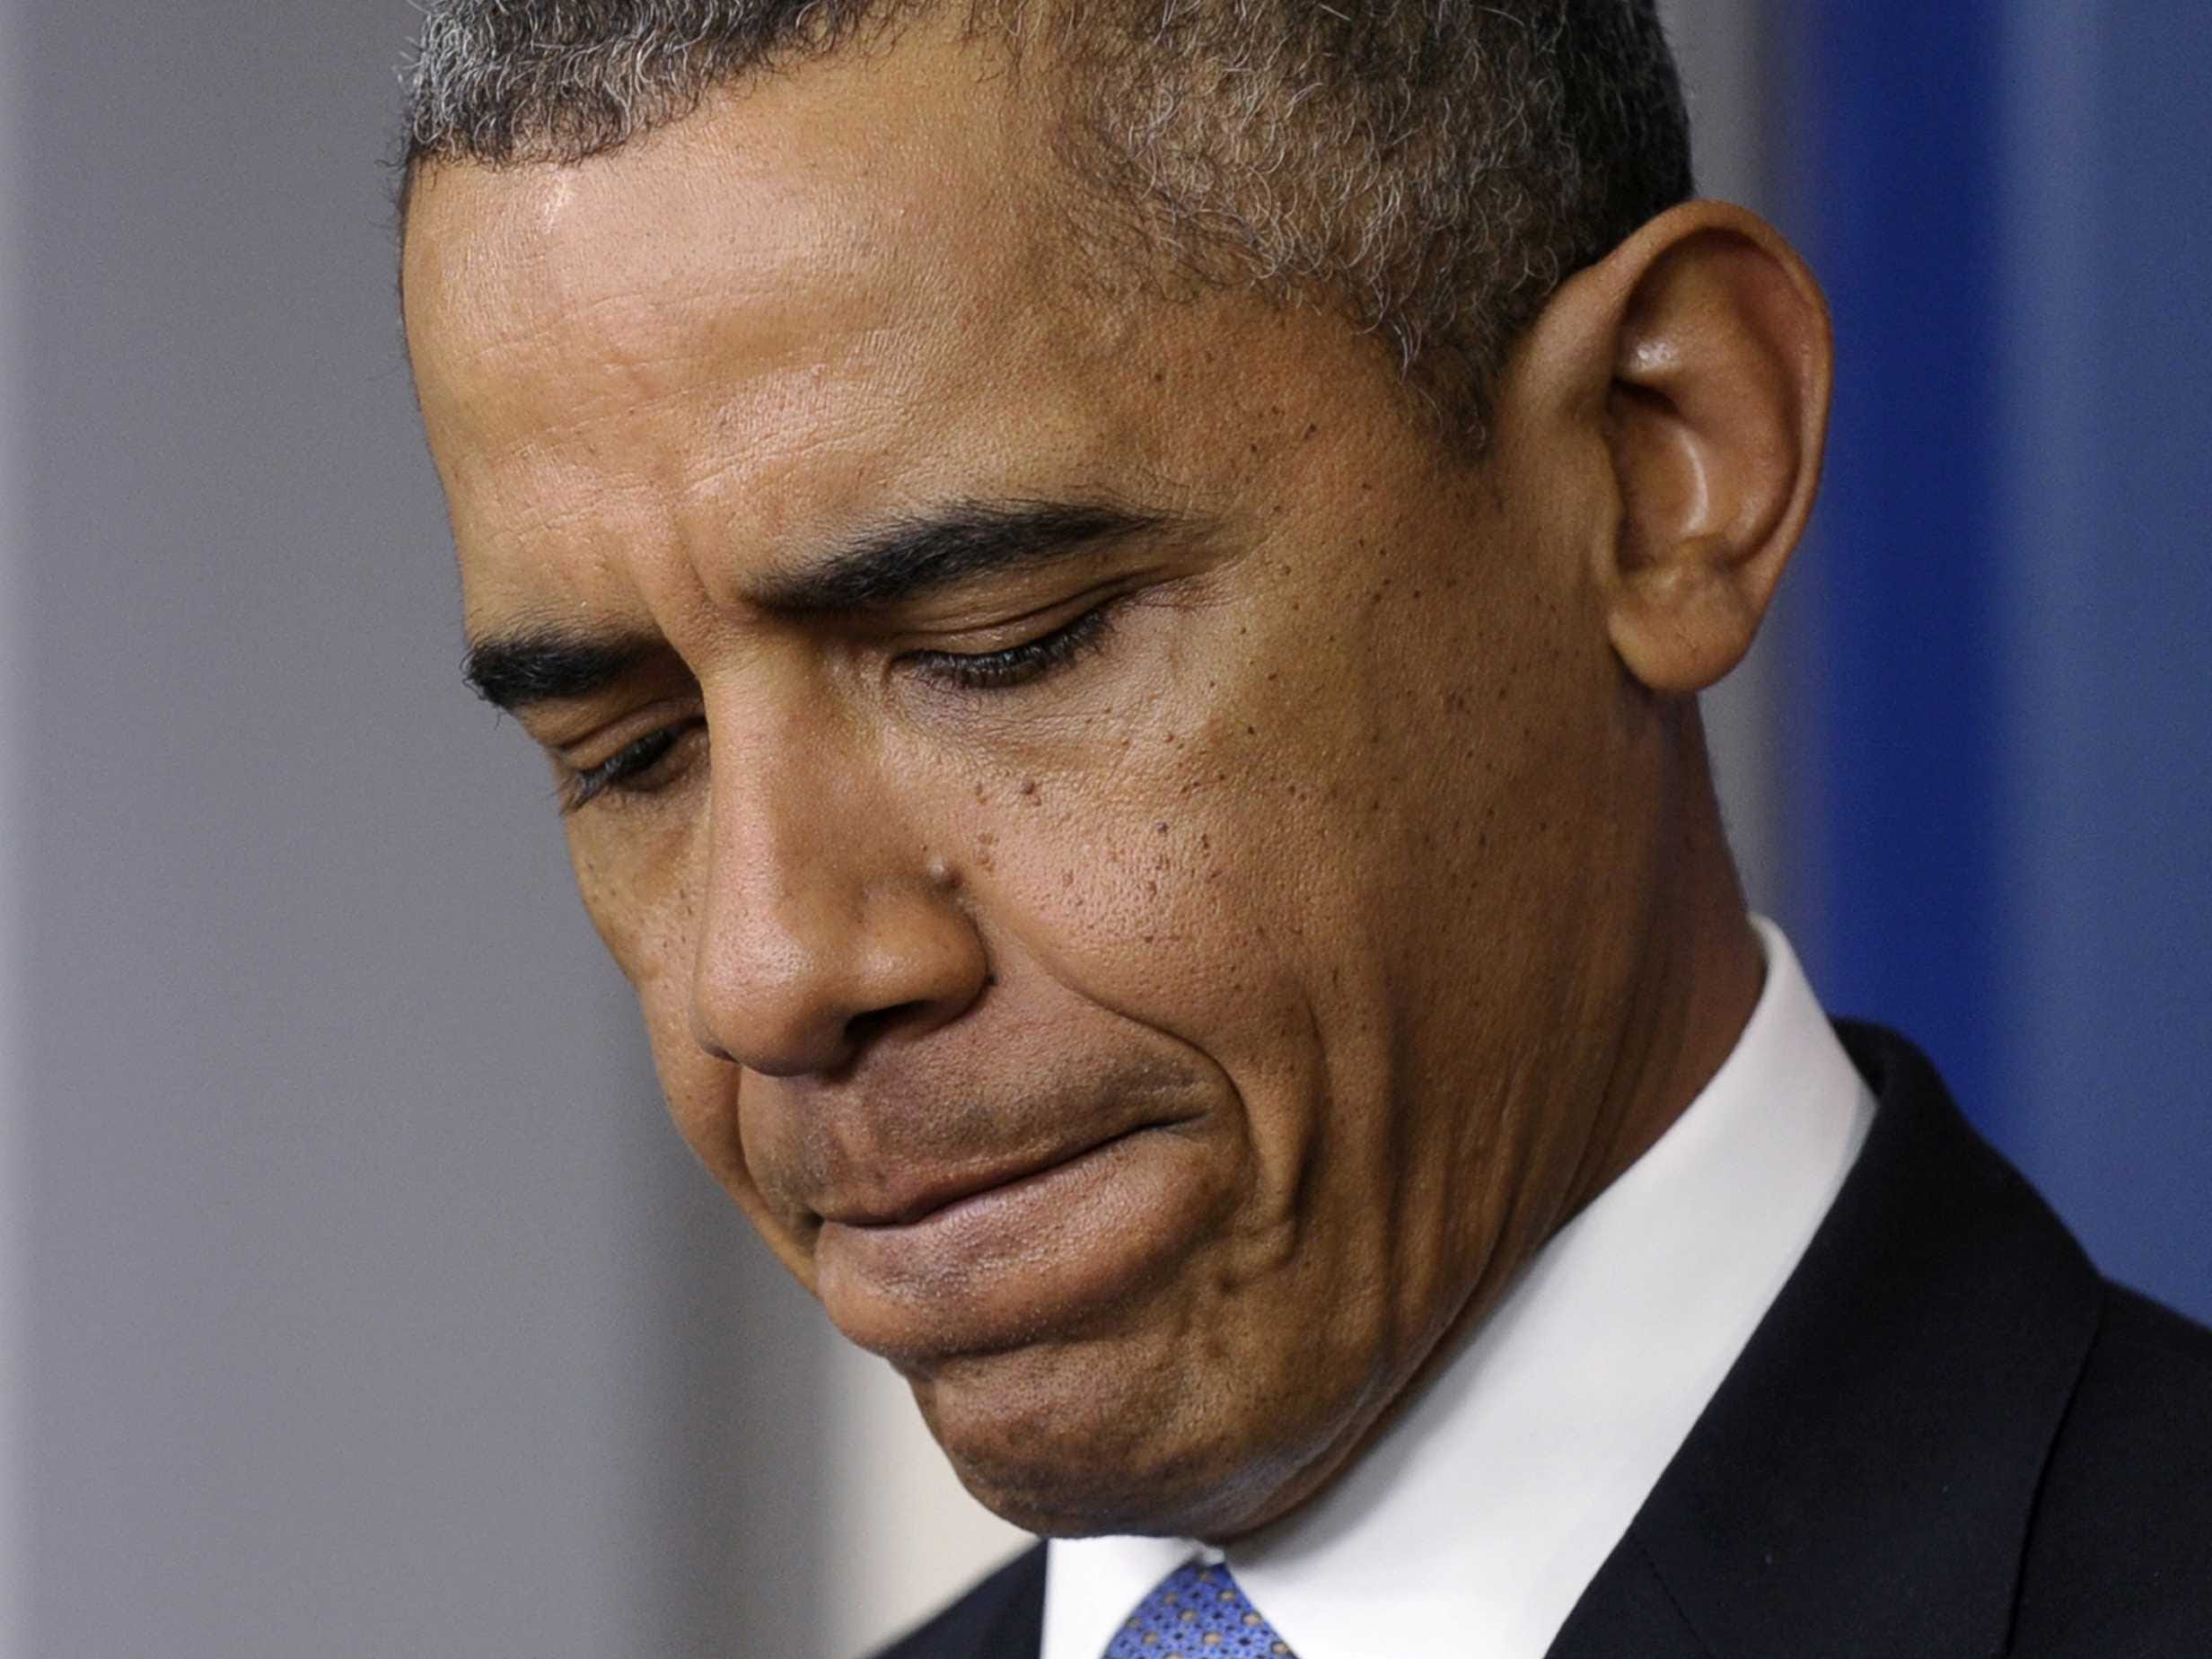 http://static4.businessinsider.com/image/5249ecf96bb3f7f25267b05d/obama-i-am-sorry.jpg